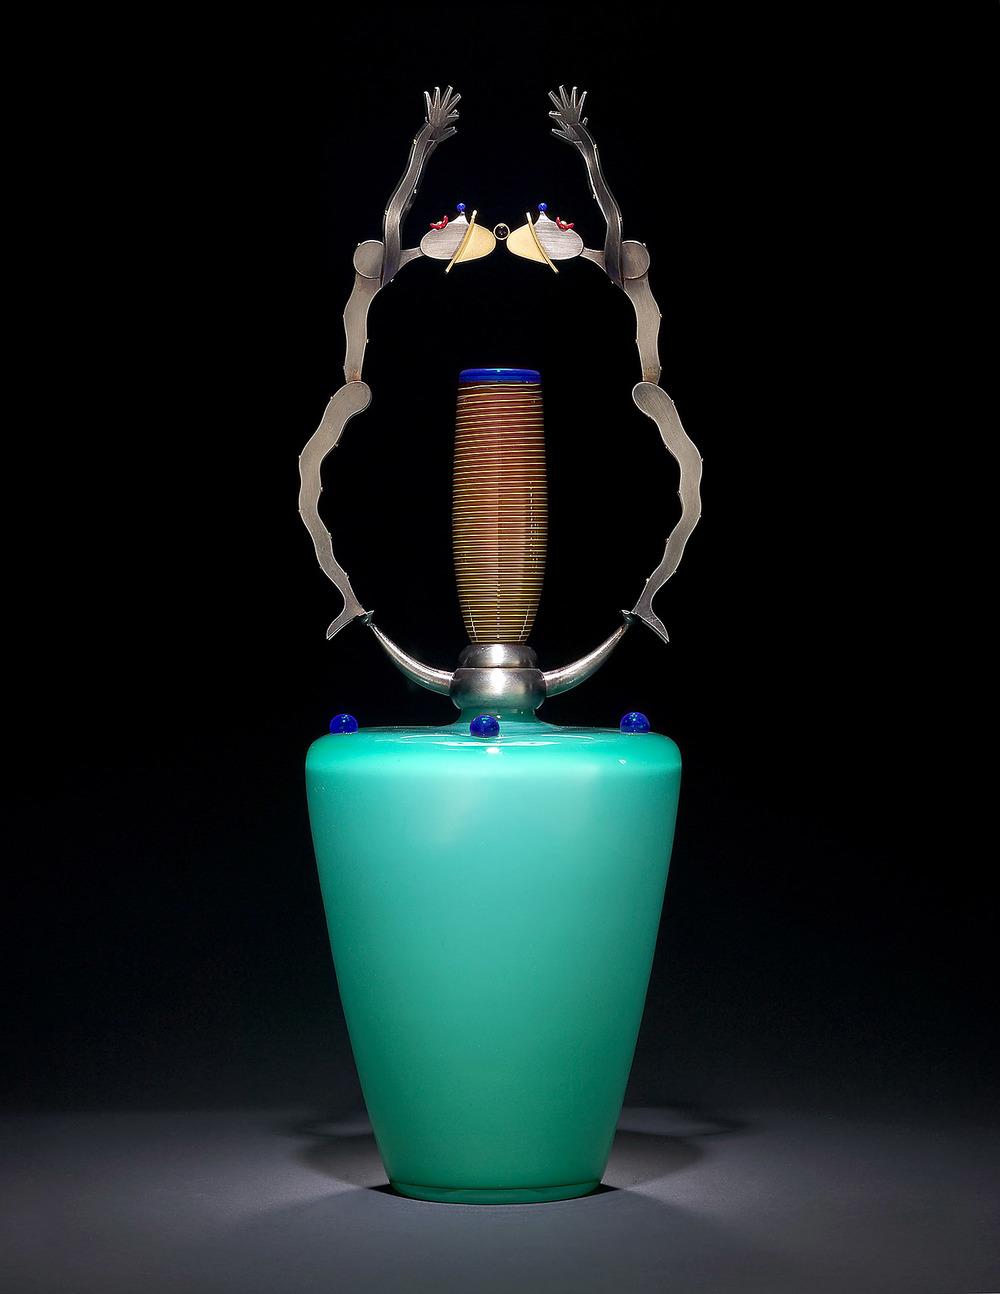 "Feelers   2003. Blown glass, nickel and gold-plated bronze, Vitrolite. 22 x 8 x 8"""